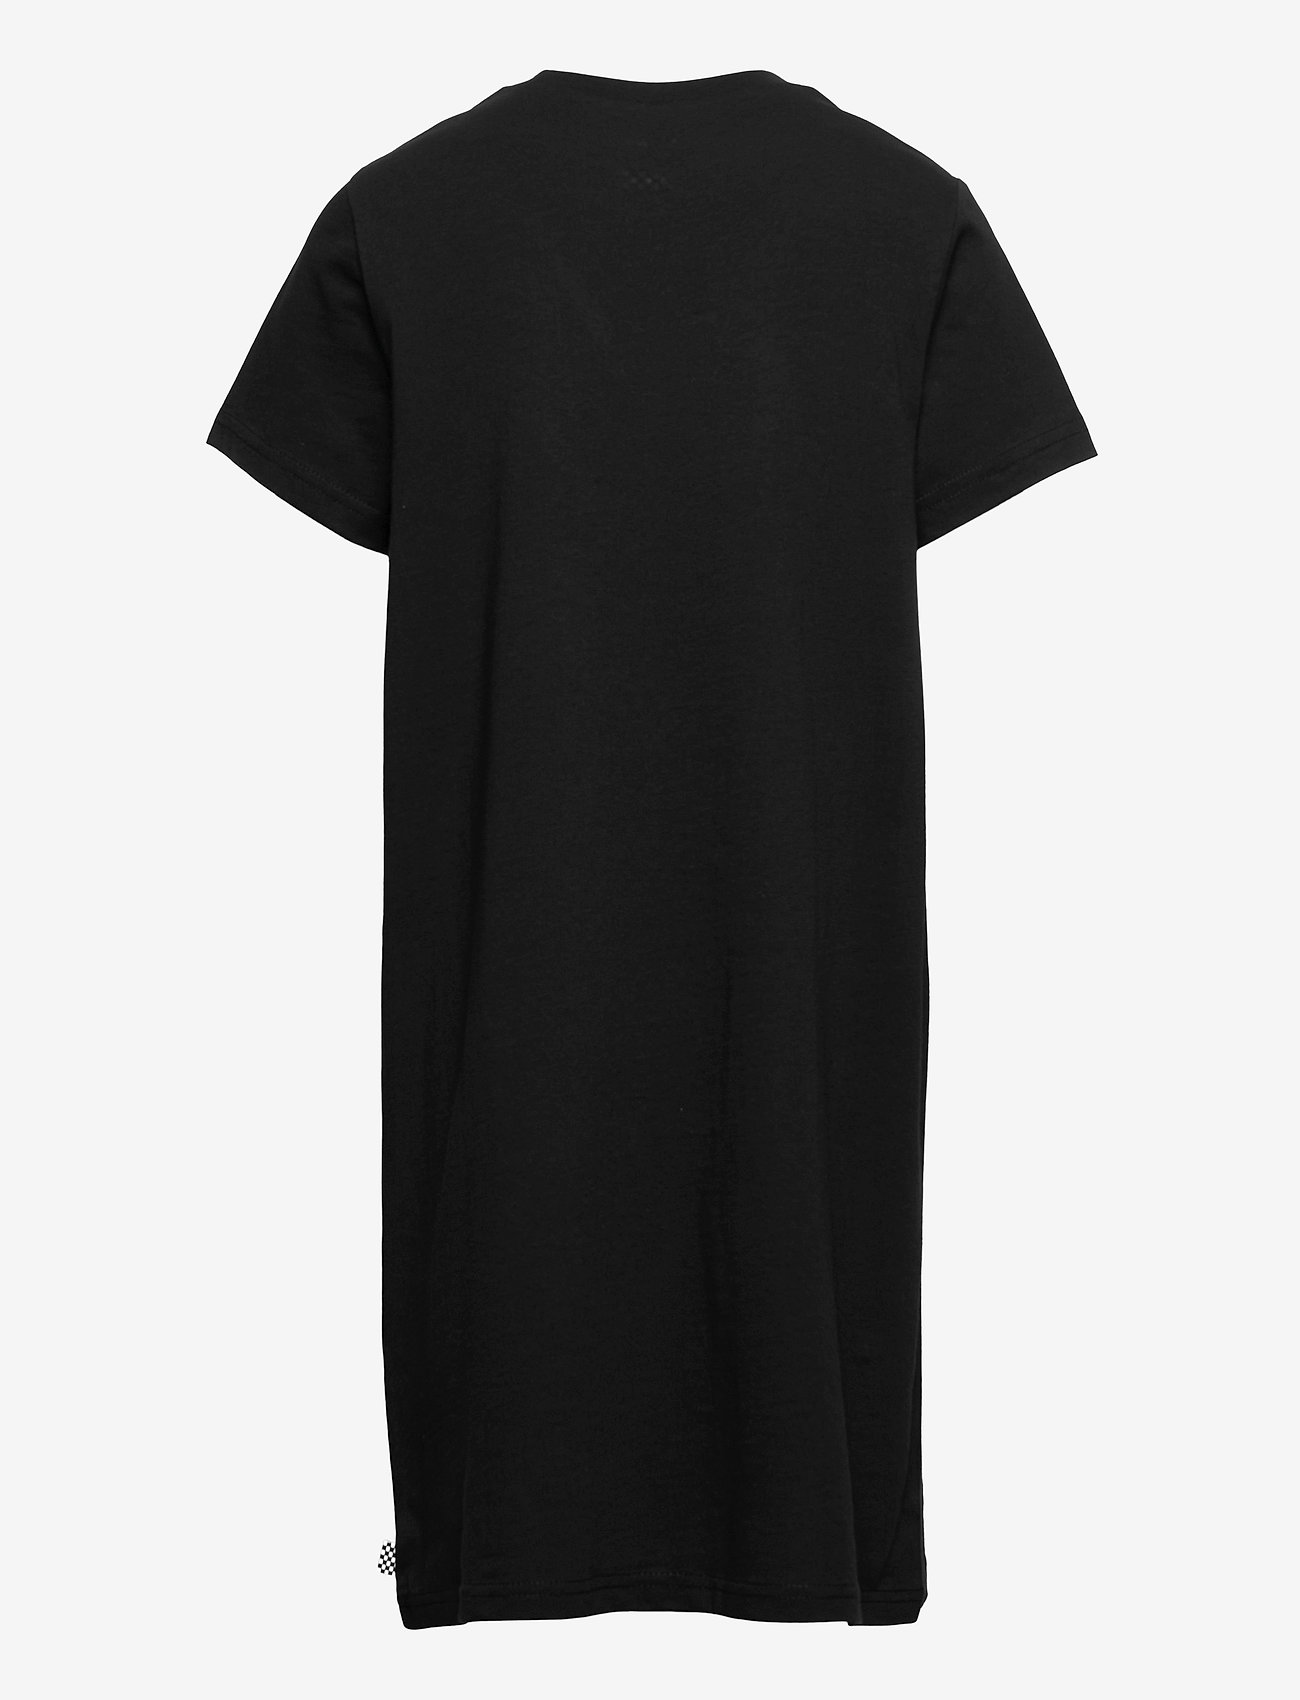 VANS - CHALKBOARD DRESS - kleider - black - 1